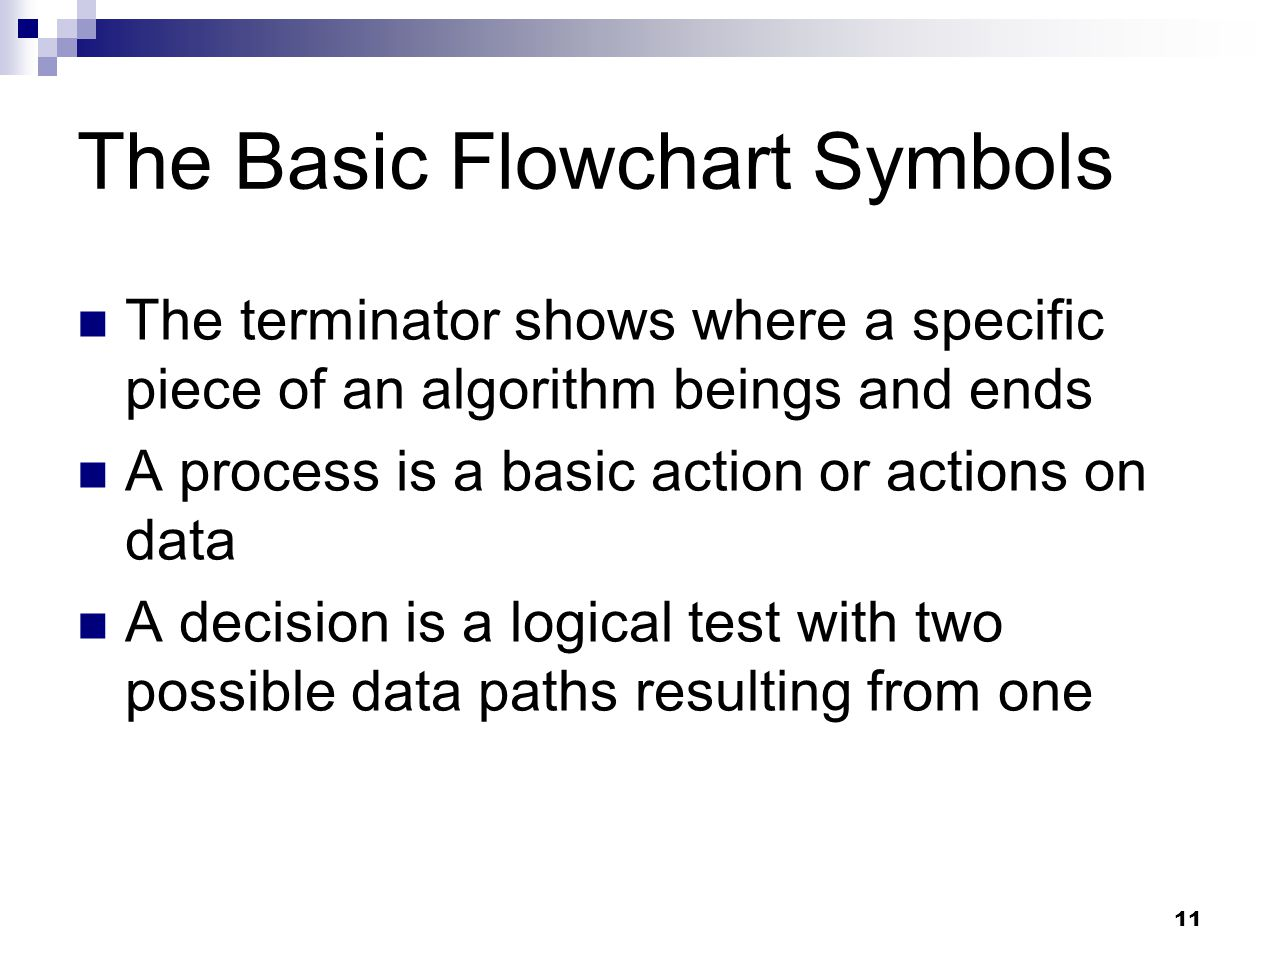 The Basic Flowchart Symbols